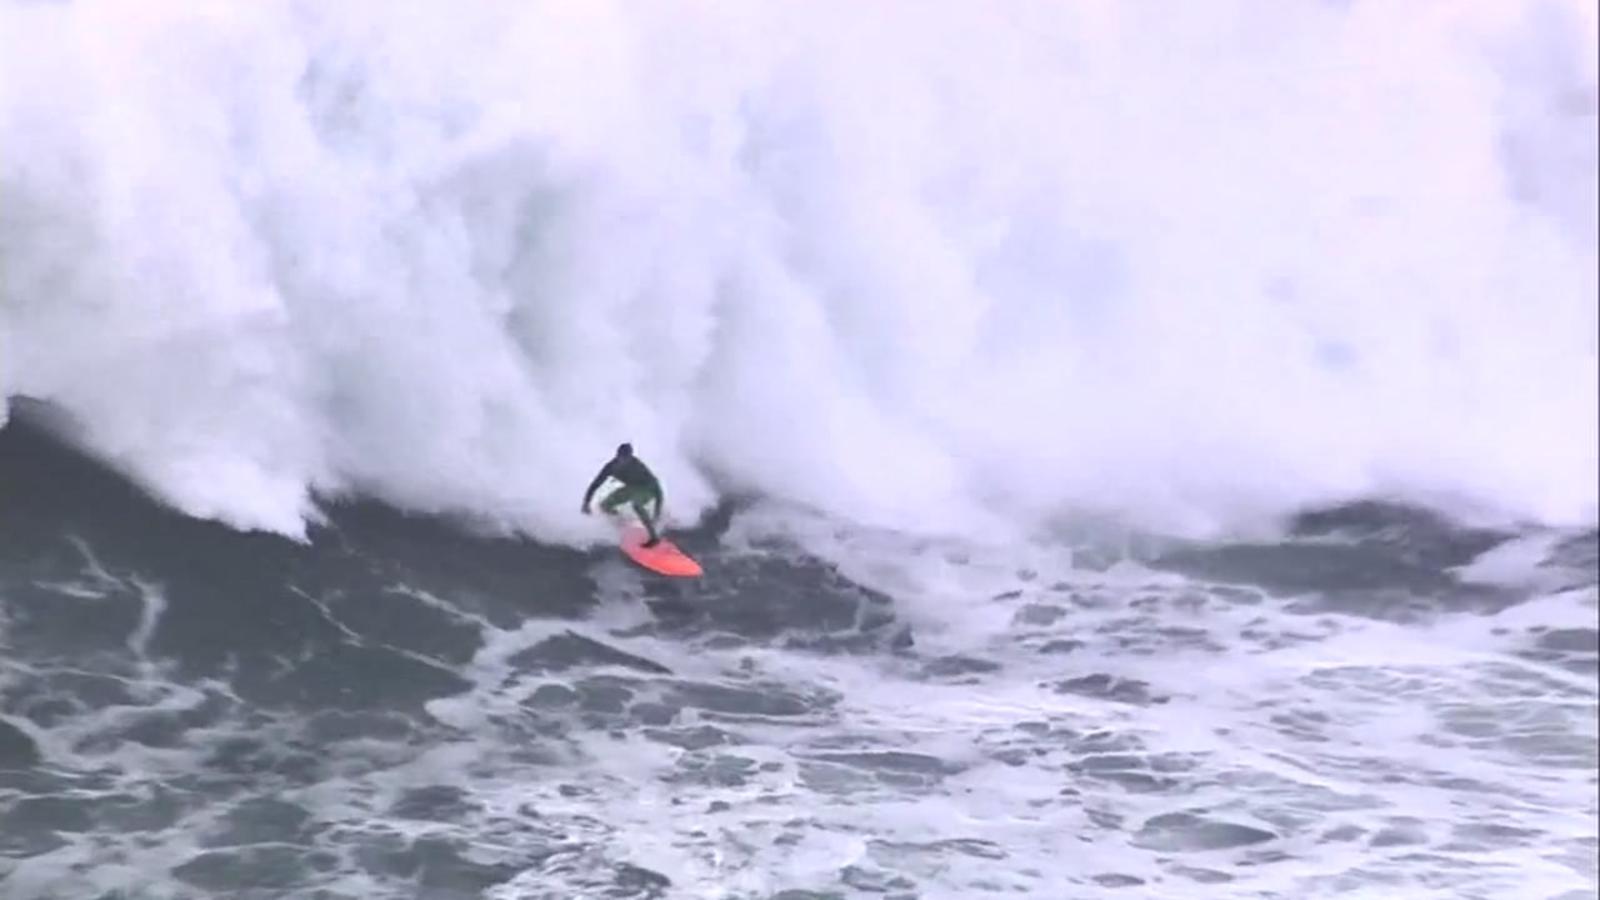 Mavericks surf season closing without contest